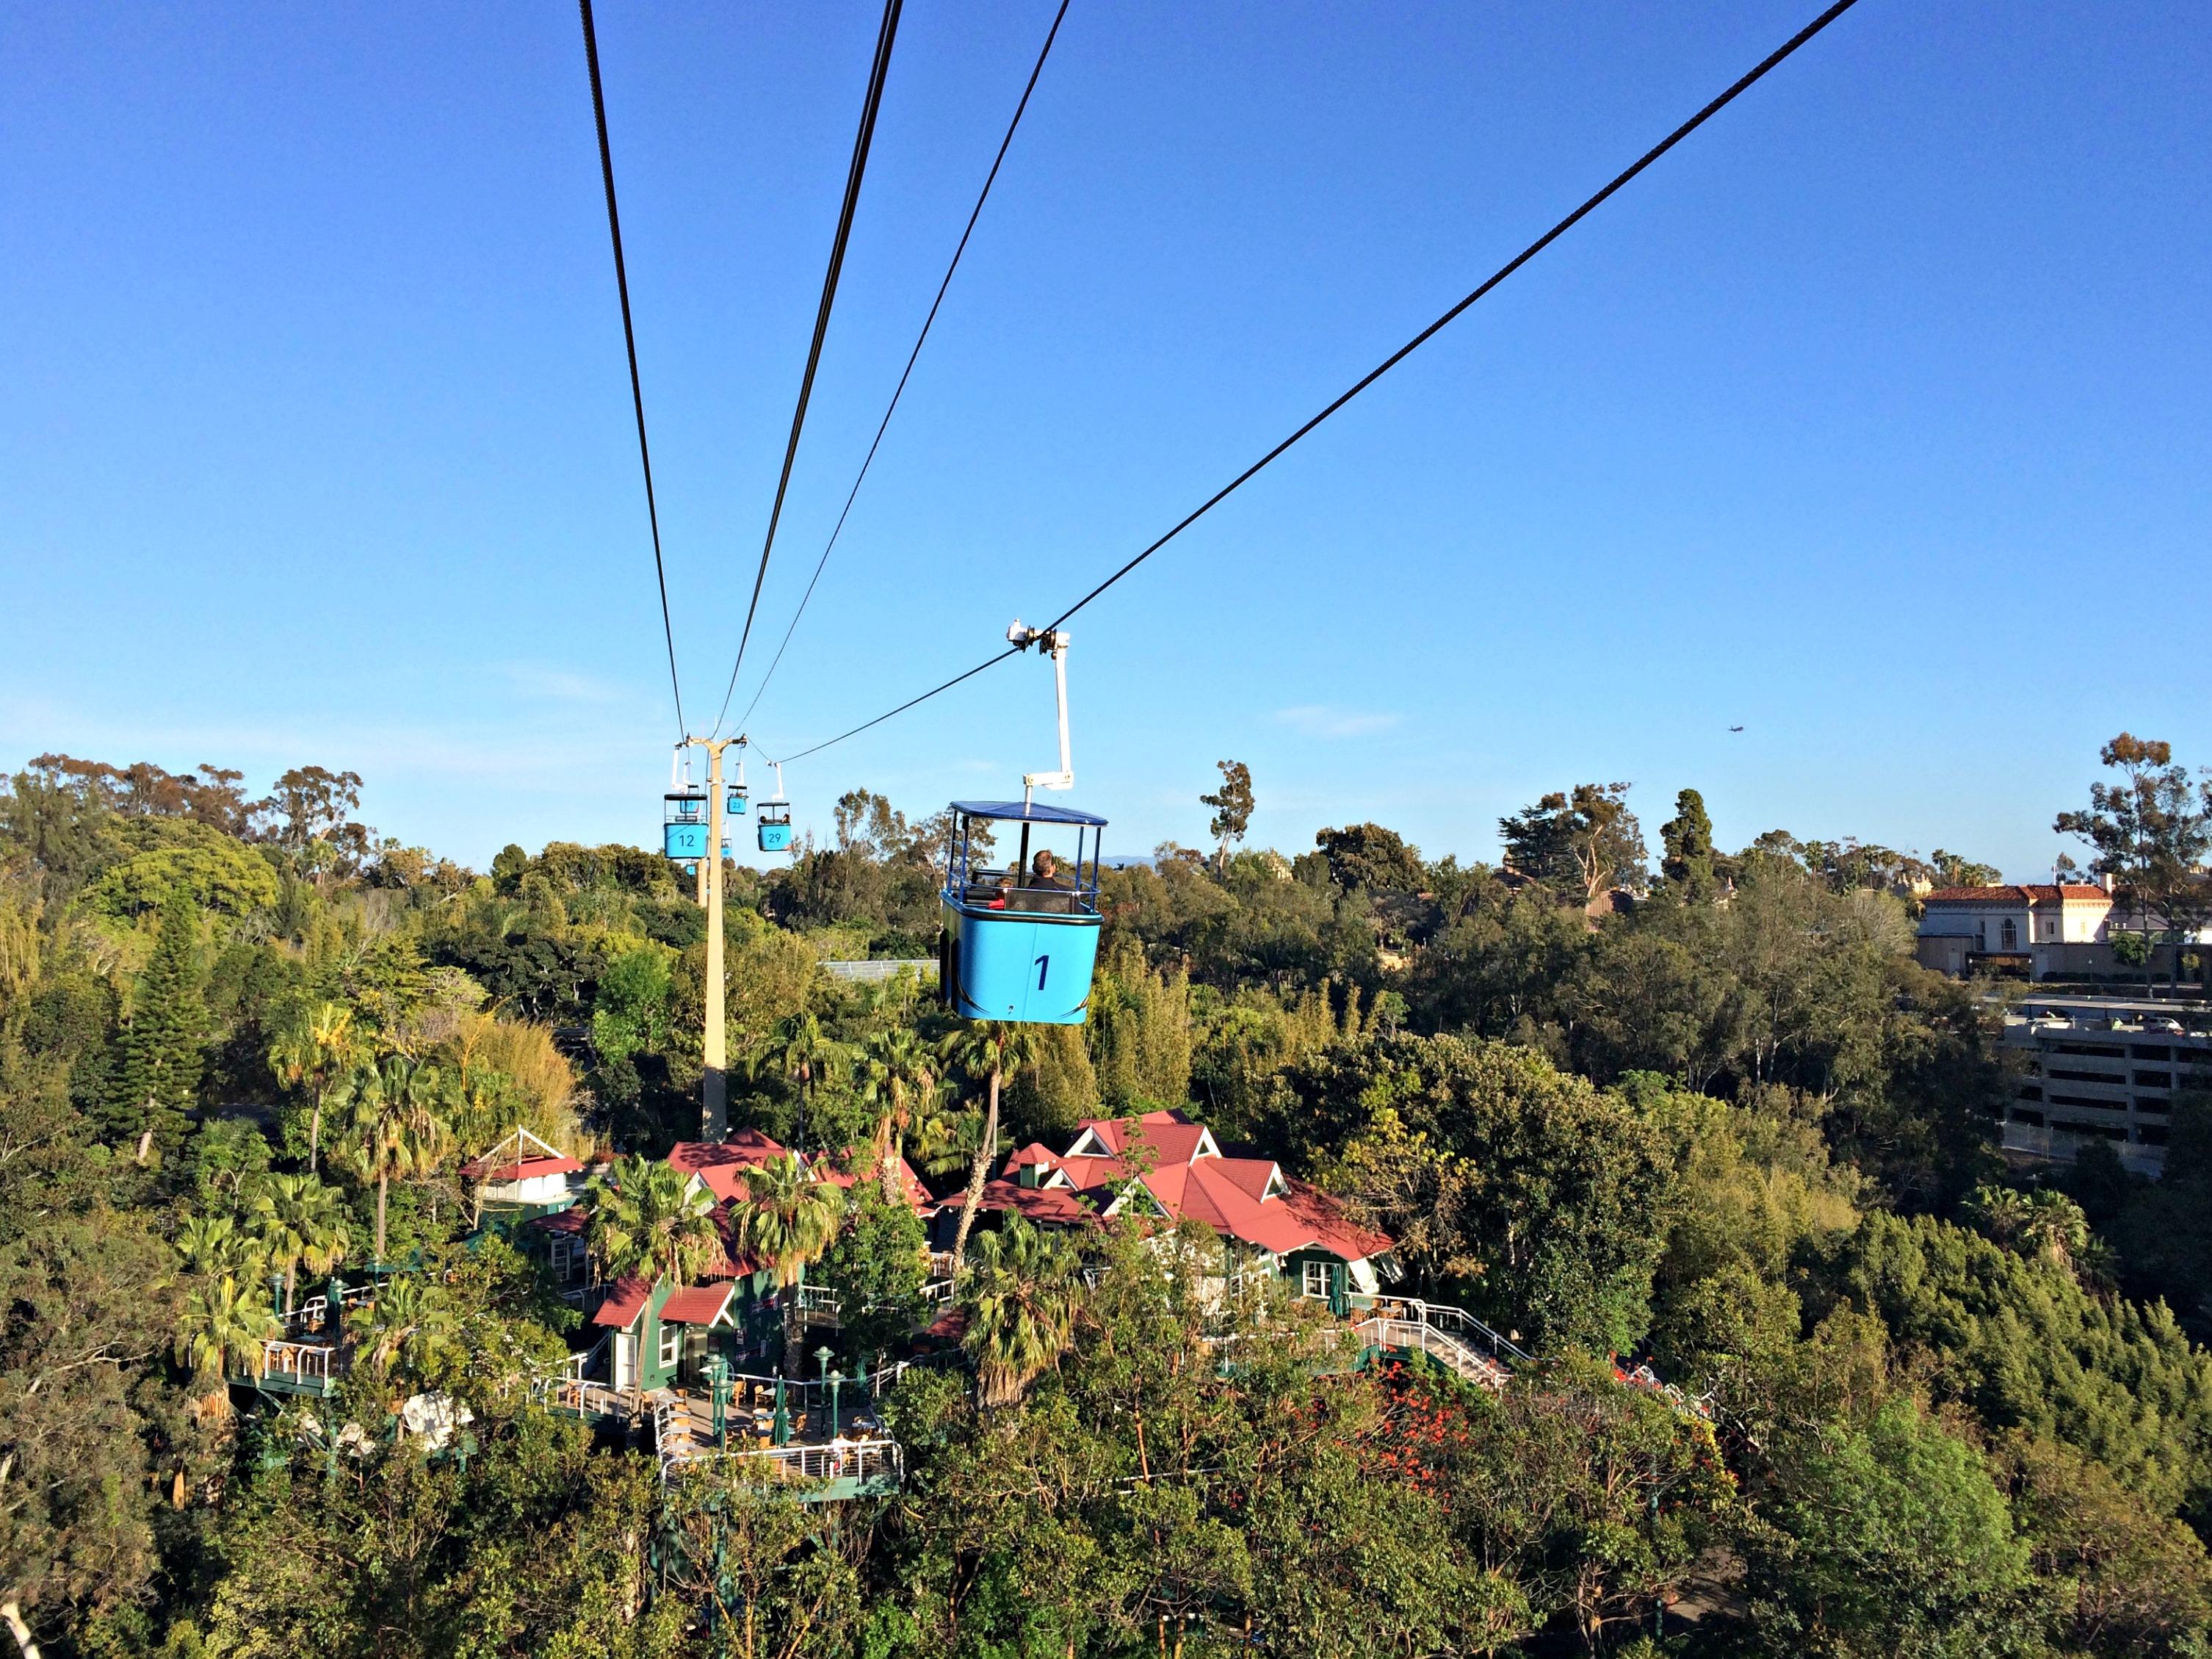 san diego zoo skyway ride